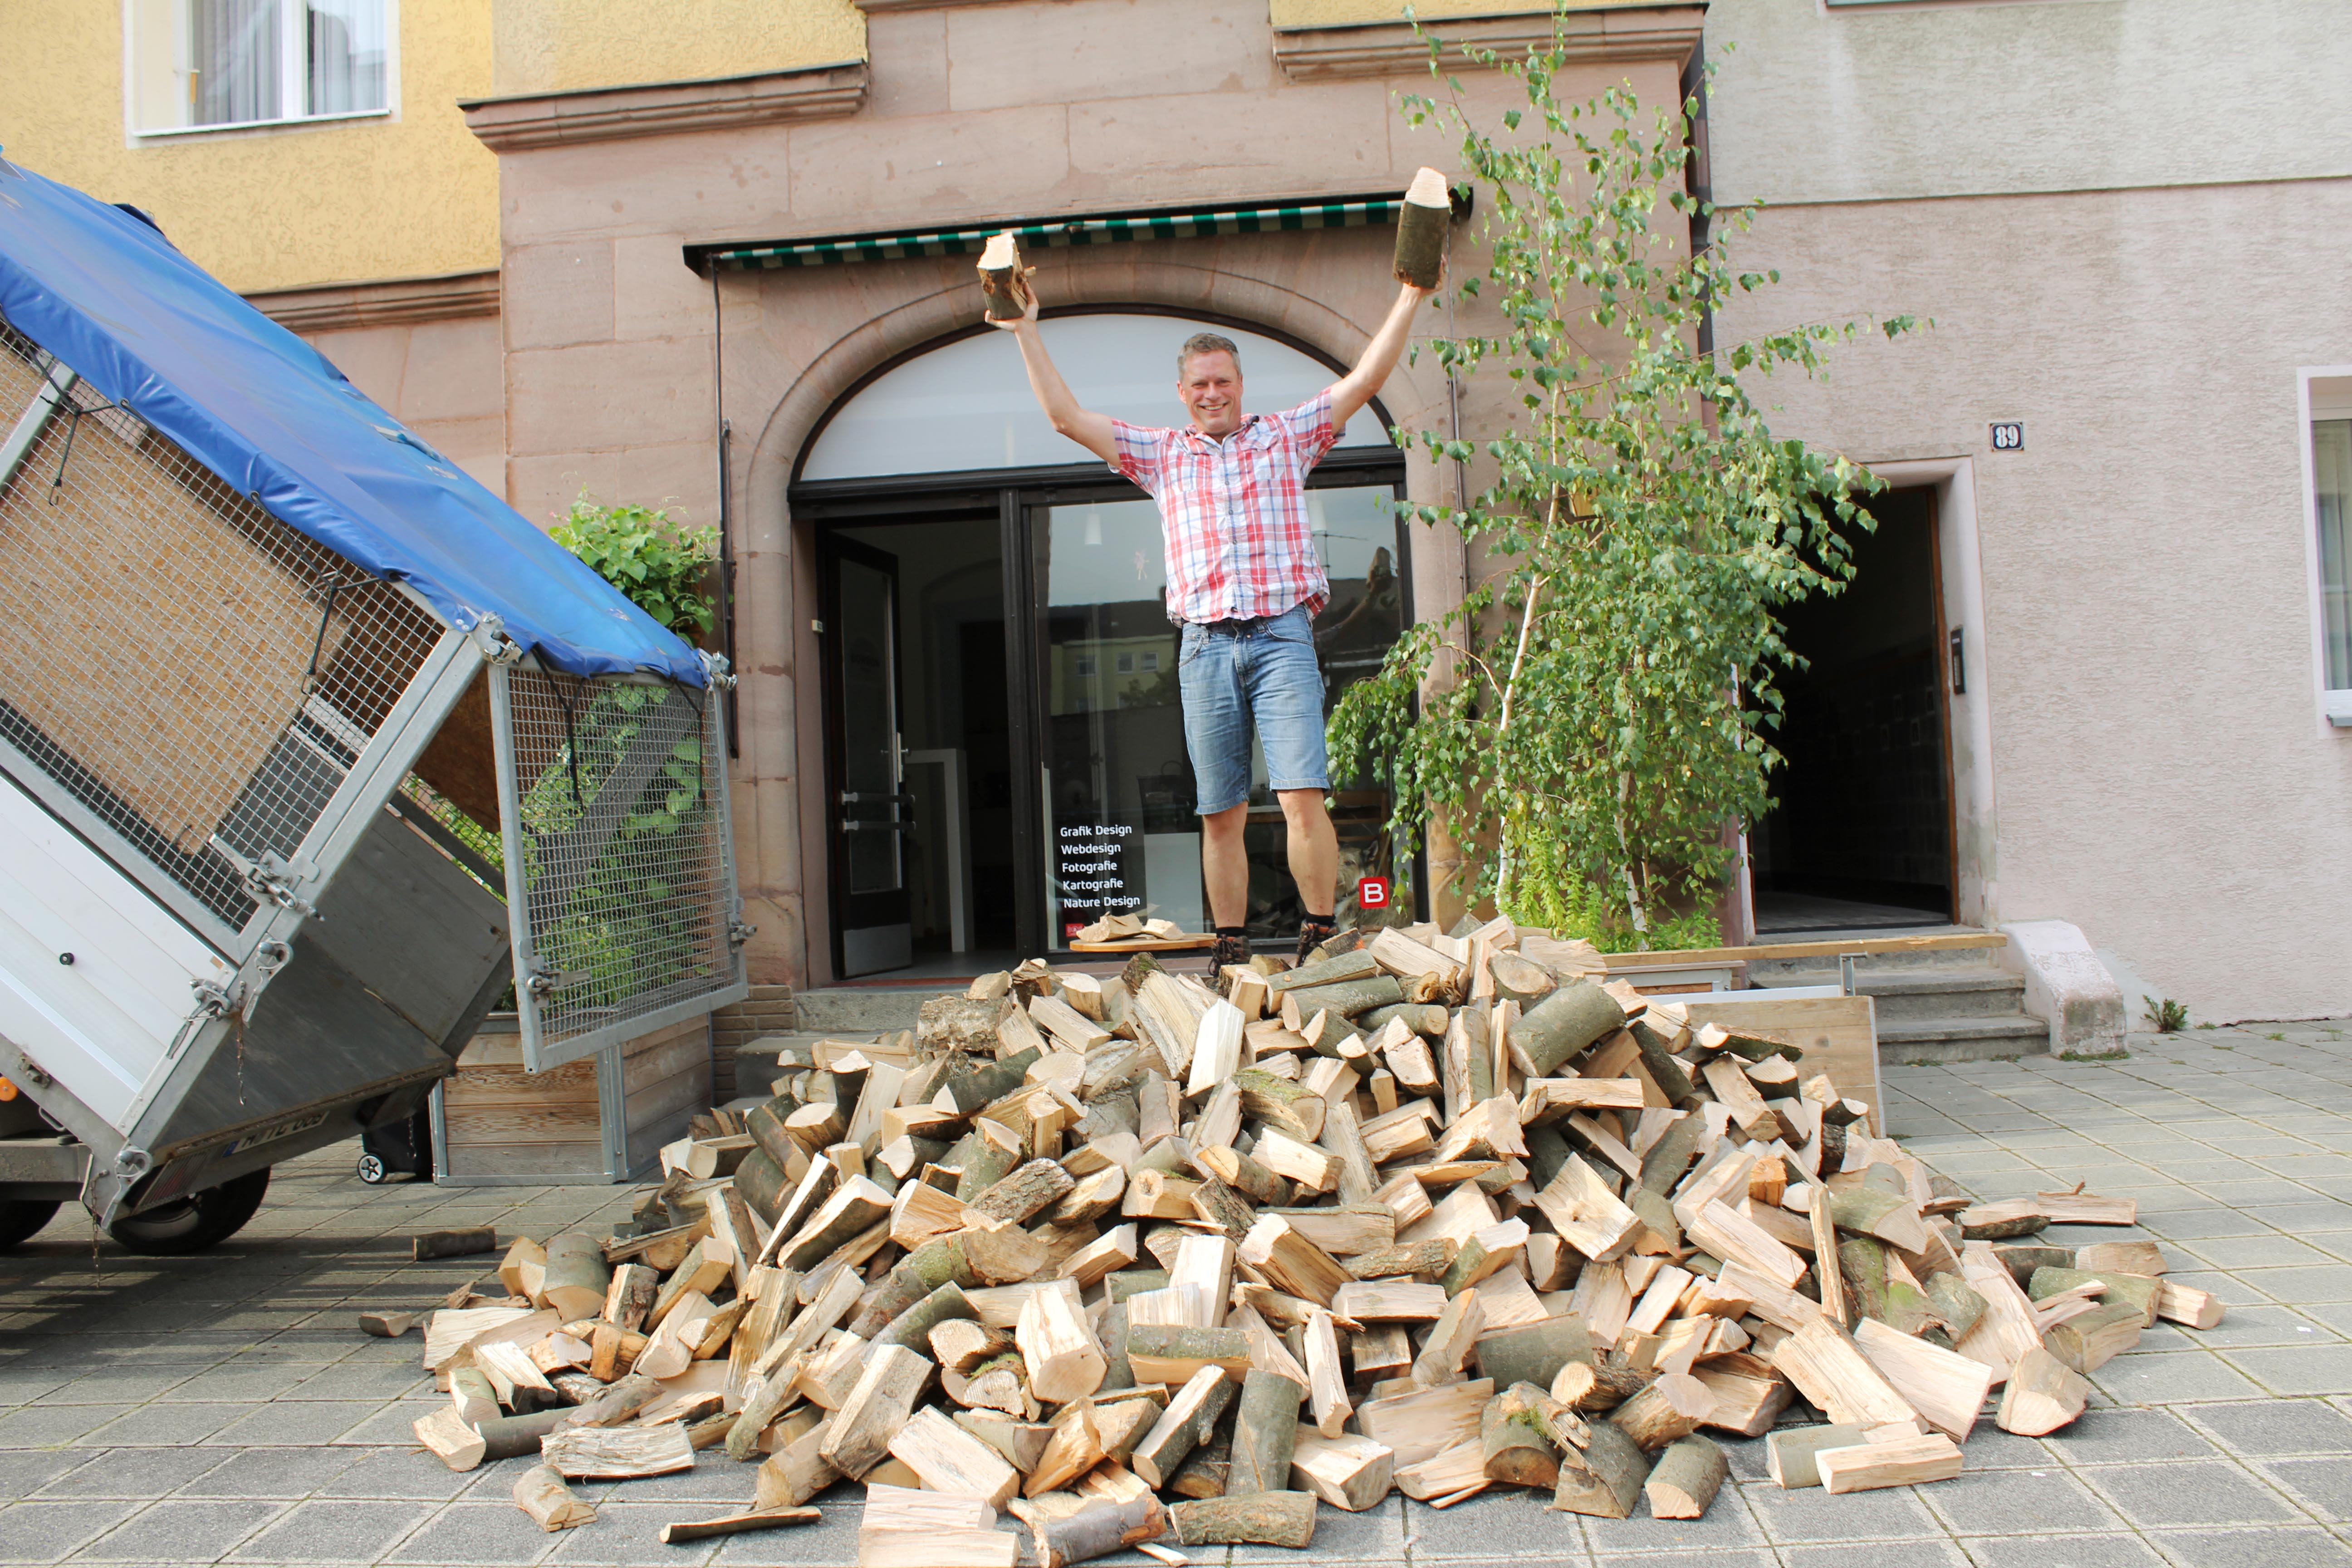 Kundenauslieferung Brennholz Kaminholz Nürnberg